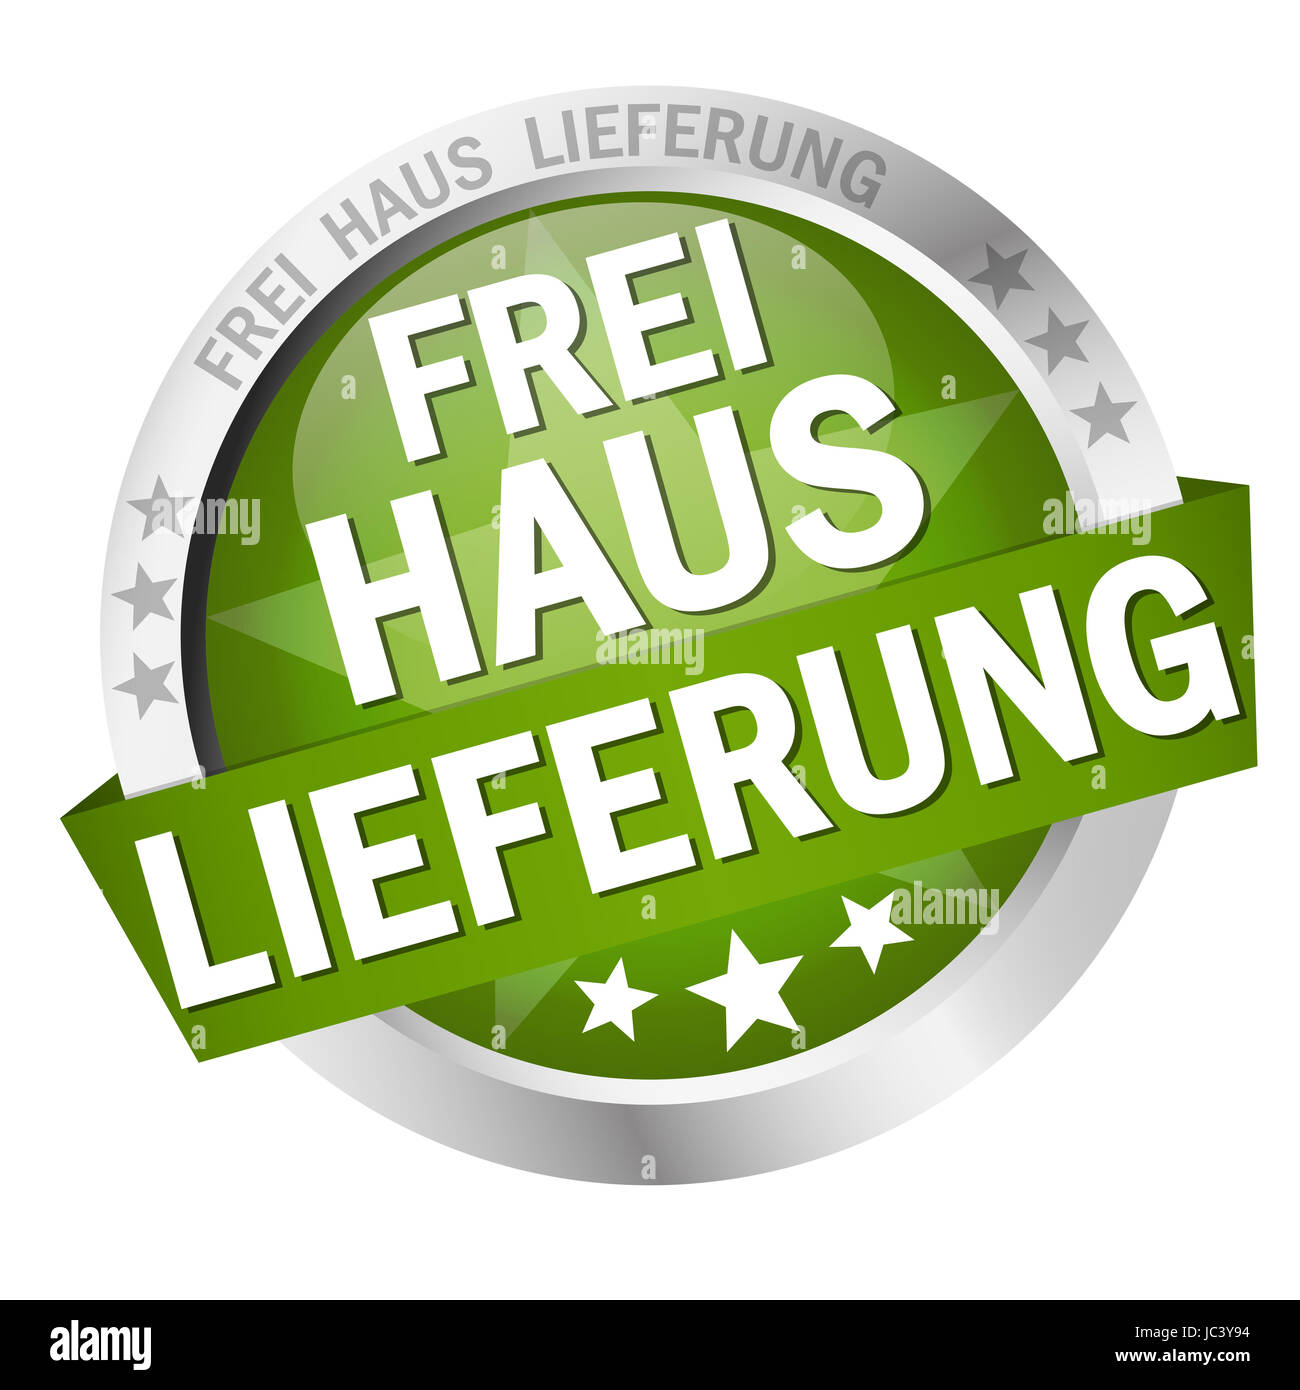 vector of button - Frei Haus Lieferung Stock Photo